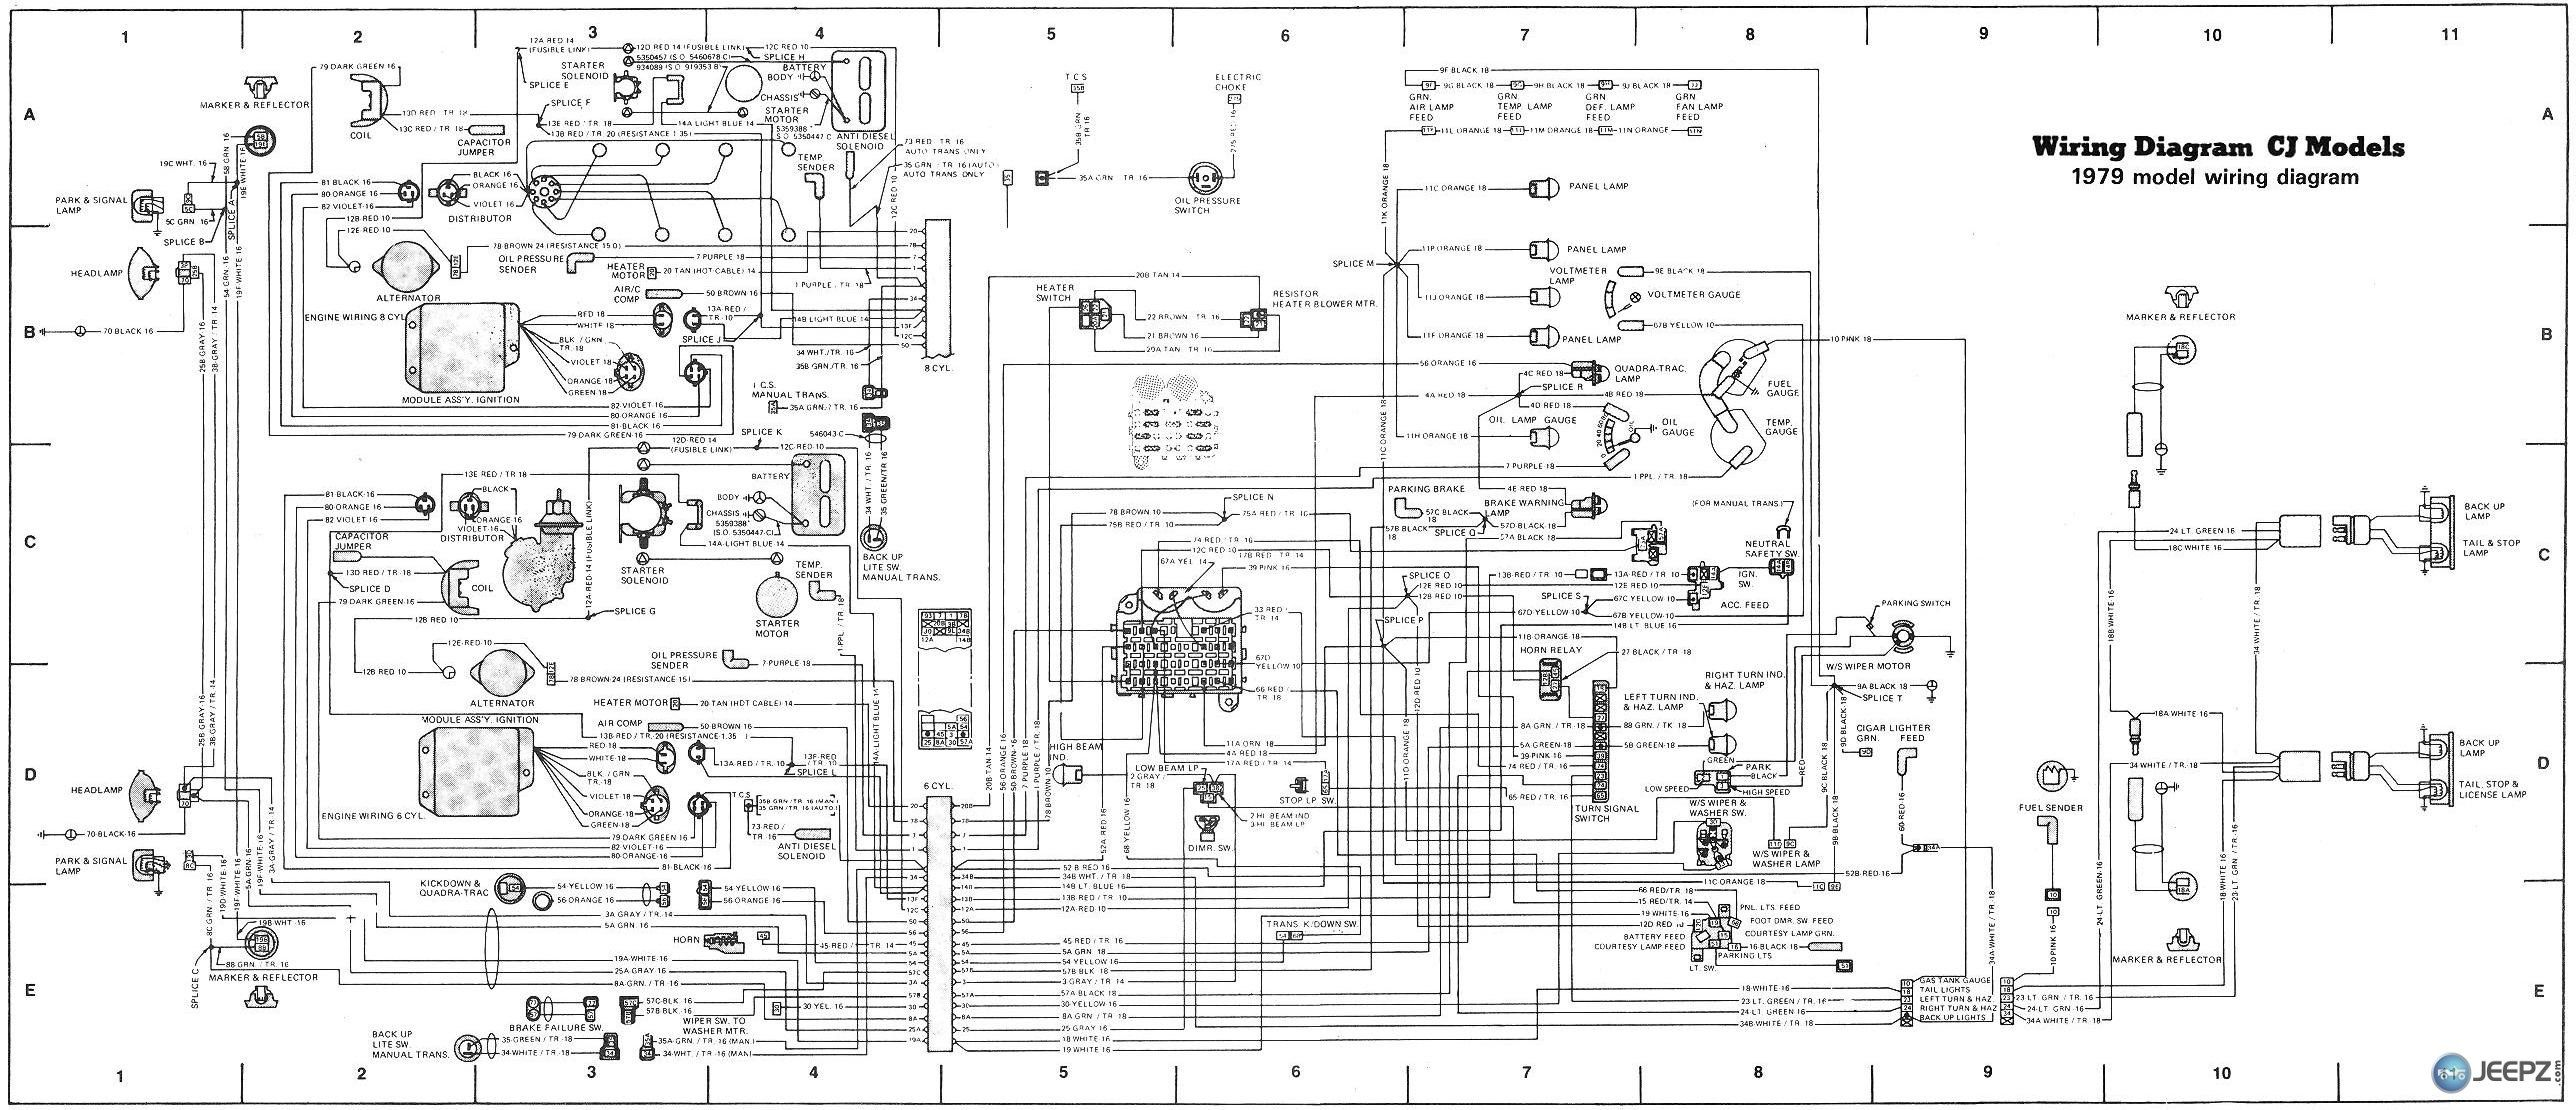 Best 1979 Jeep Cj7 Wiring Diagram Jeep Cj7 Diagram Cj7